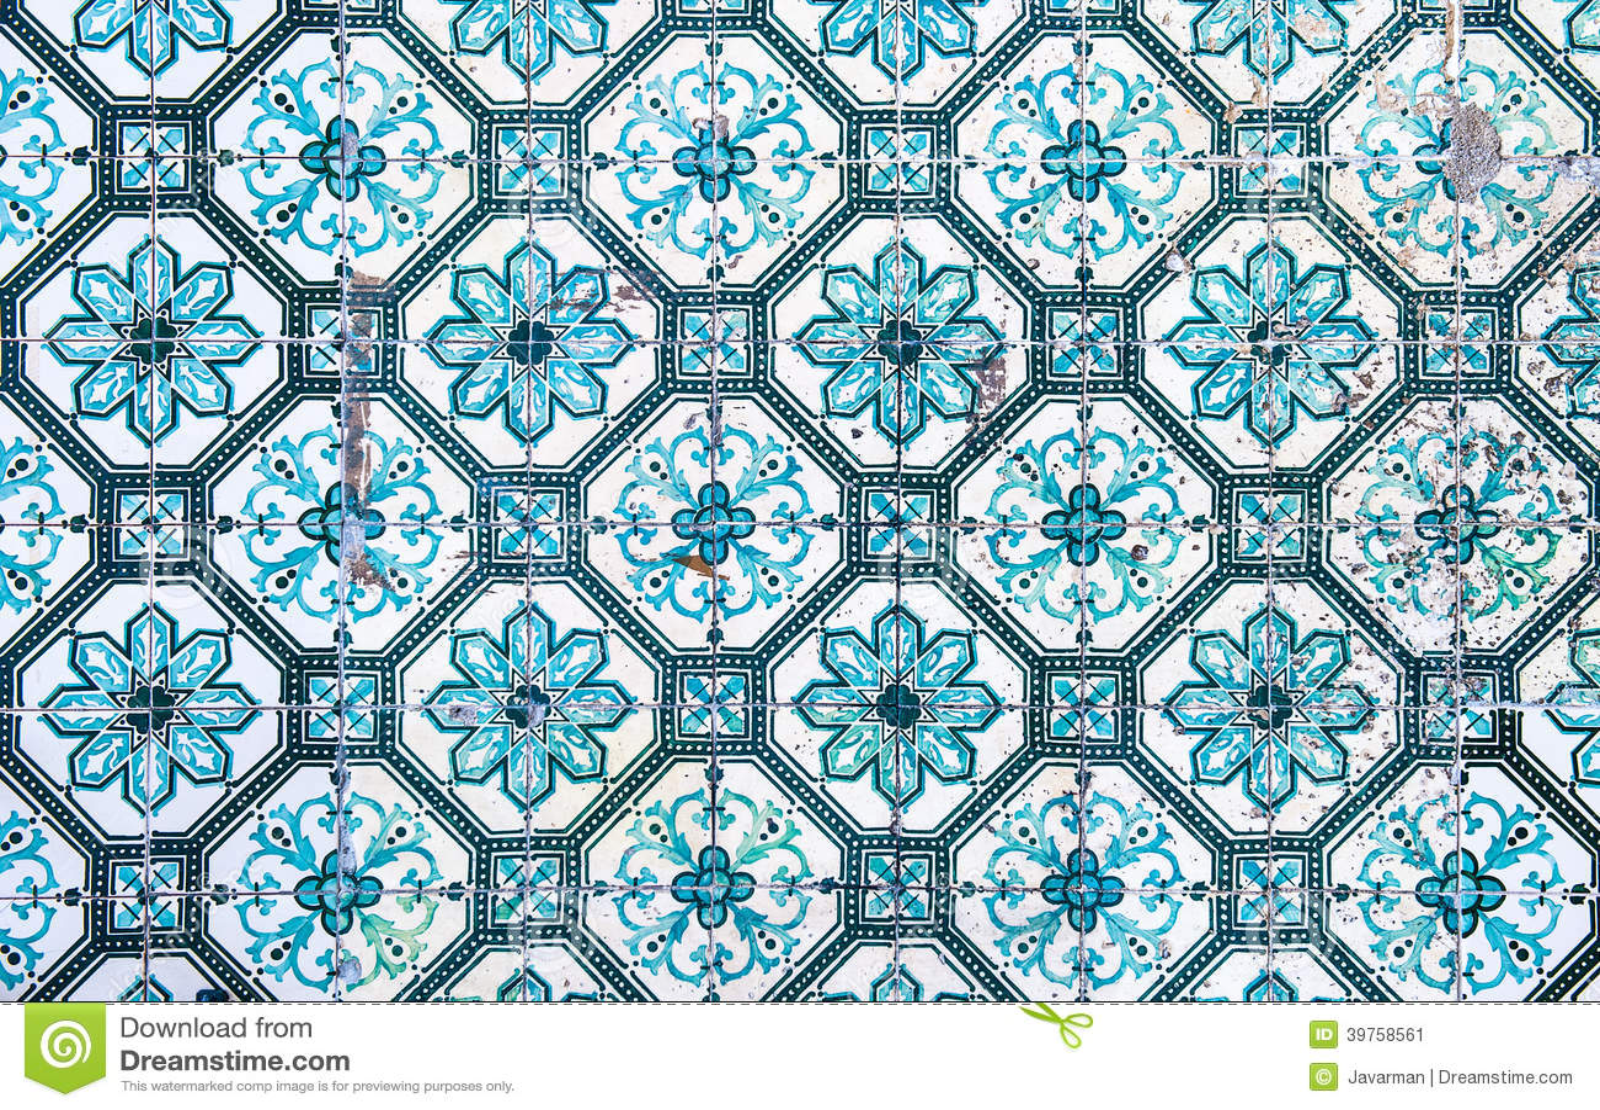 Azulejos Traditional Portuguese Tiles Stock Illustration